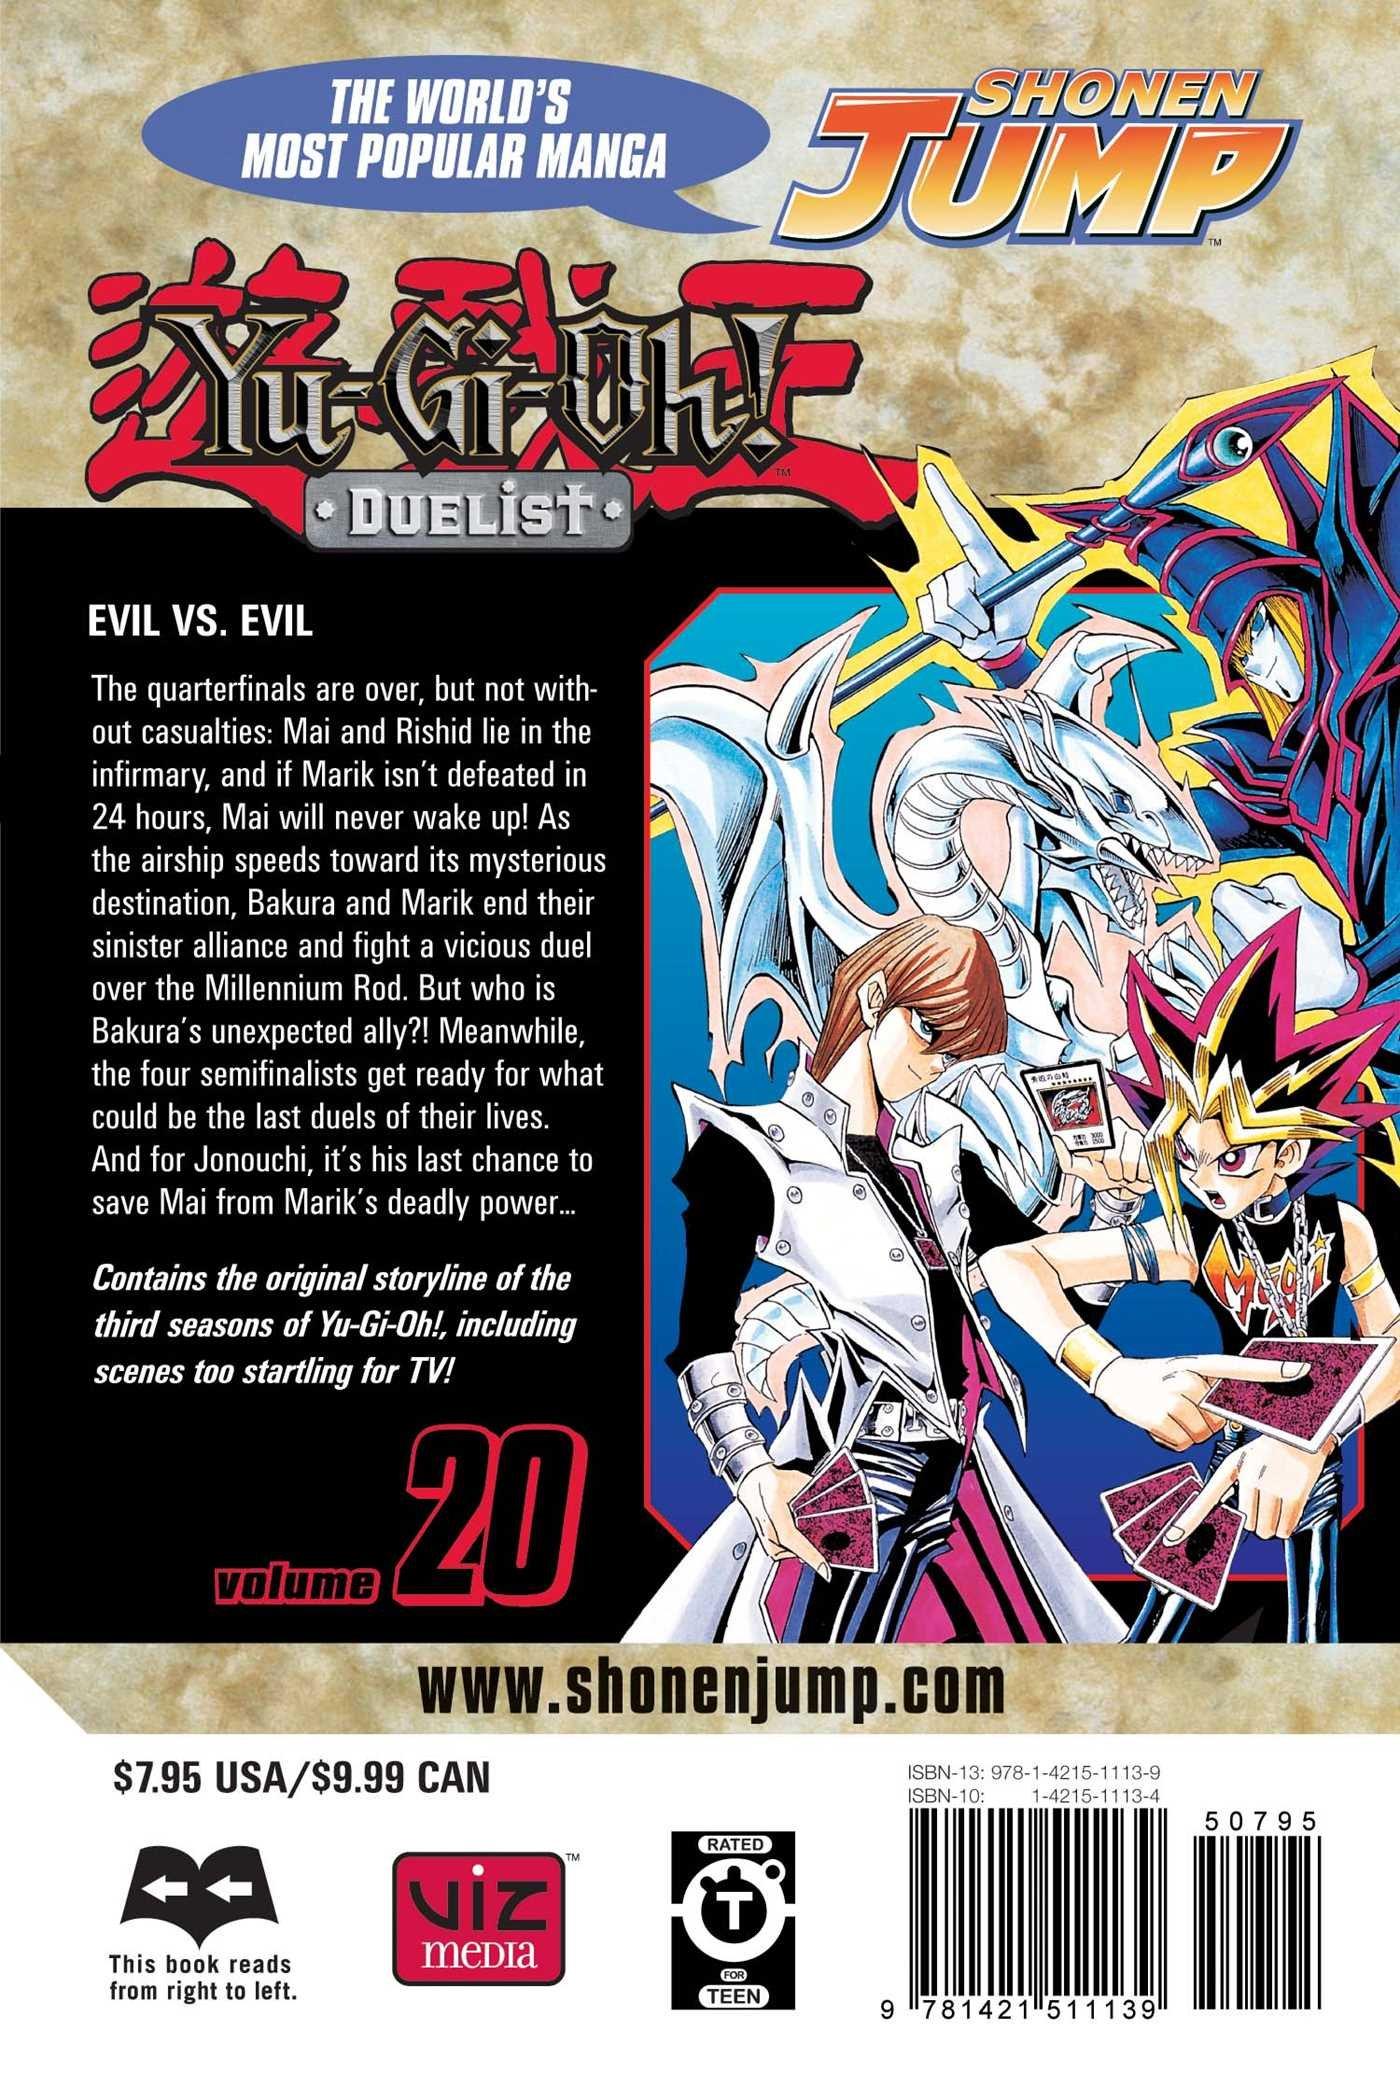 Yu-Gi-Oh!: Duelist, Vol. 20: Evil Vs. Evil